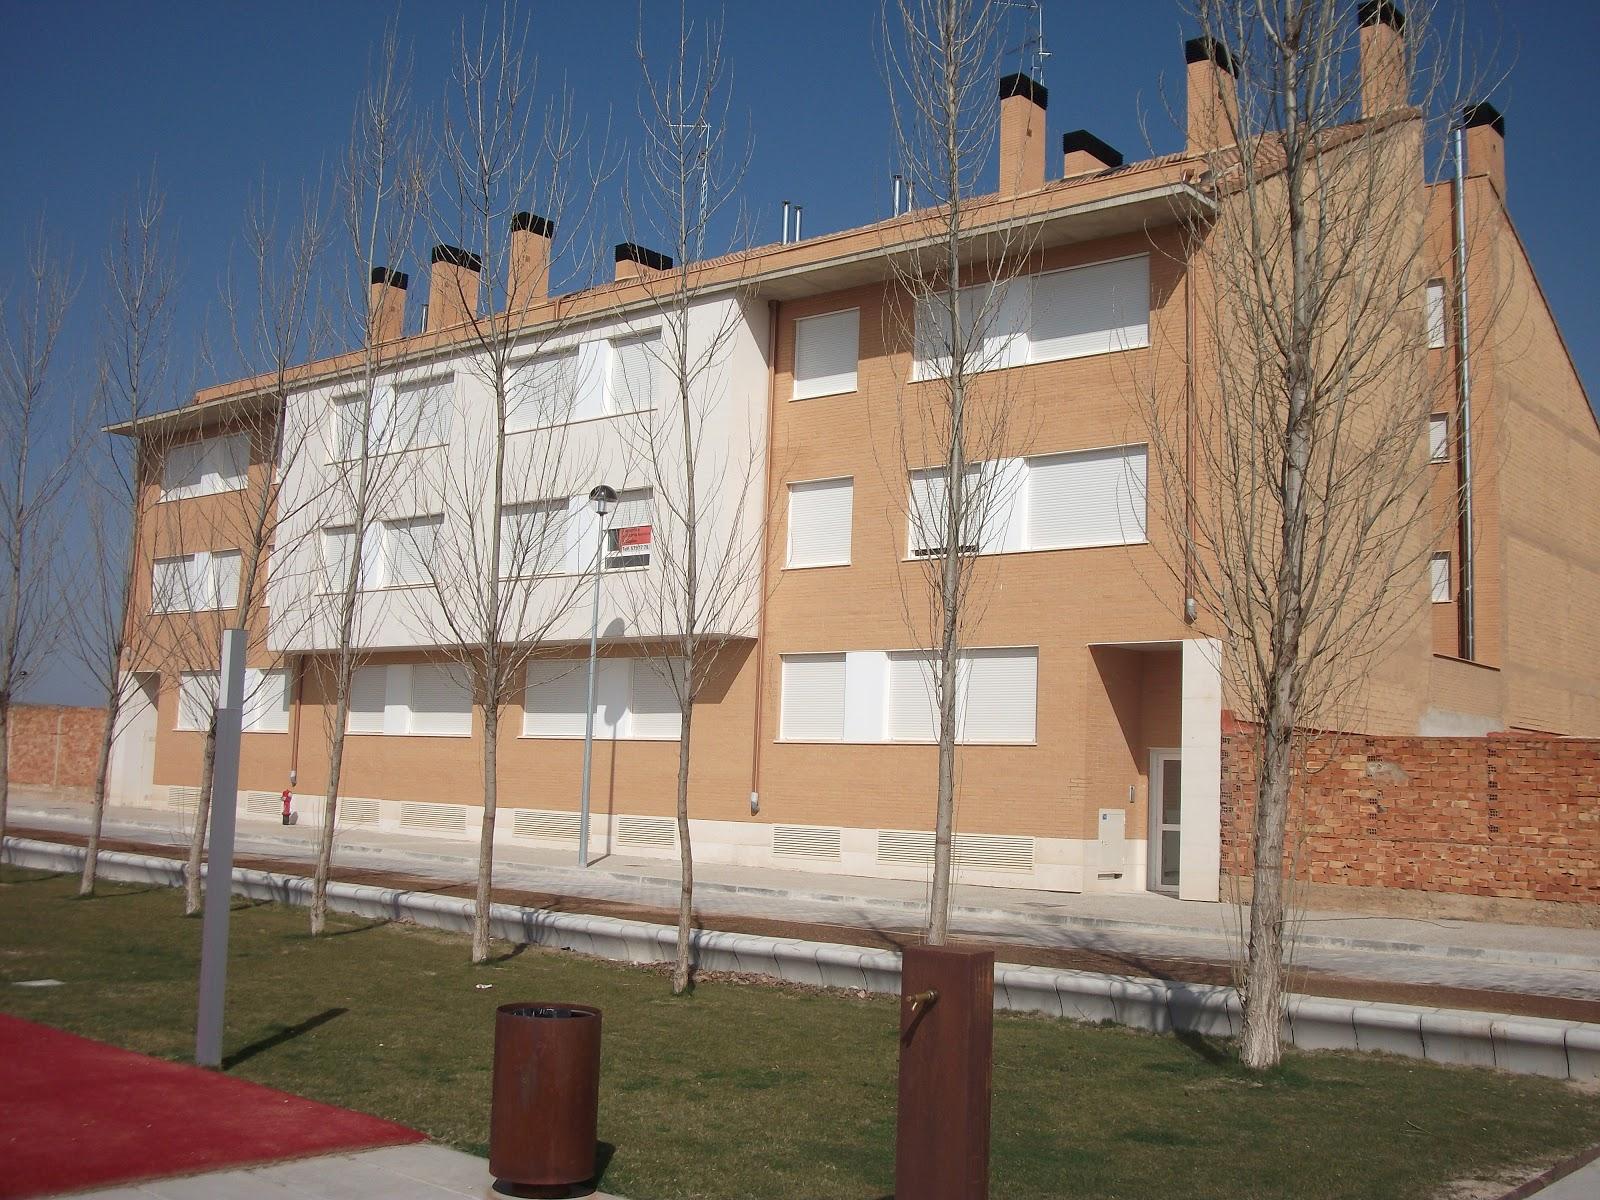 Arquitecto tecnico navarra 24 viviendas en arrubal logro o - Casa paz logrono ...